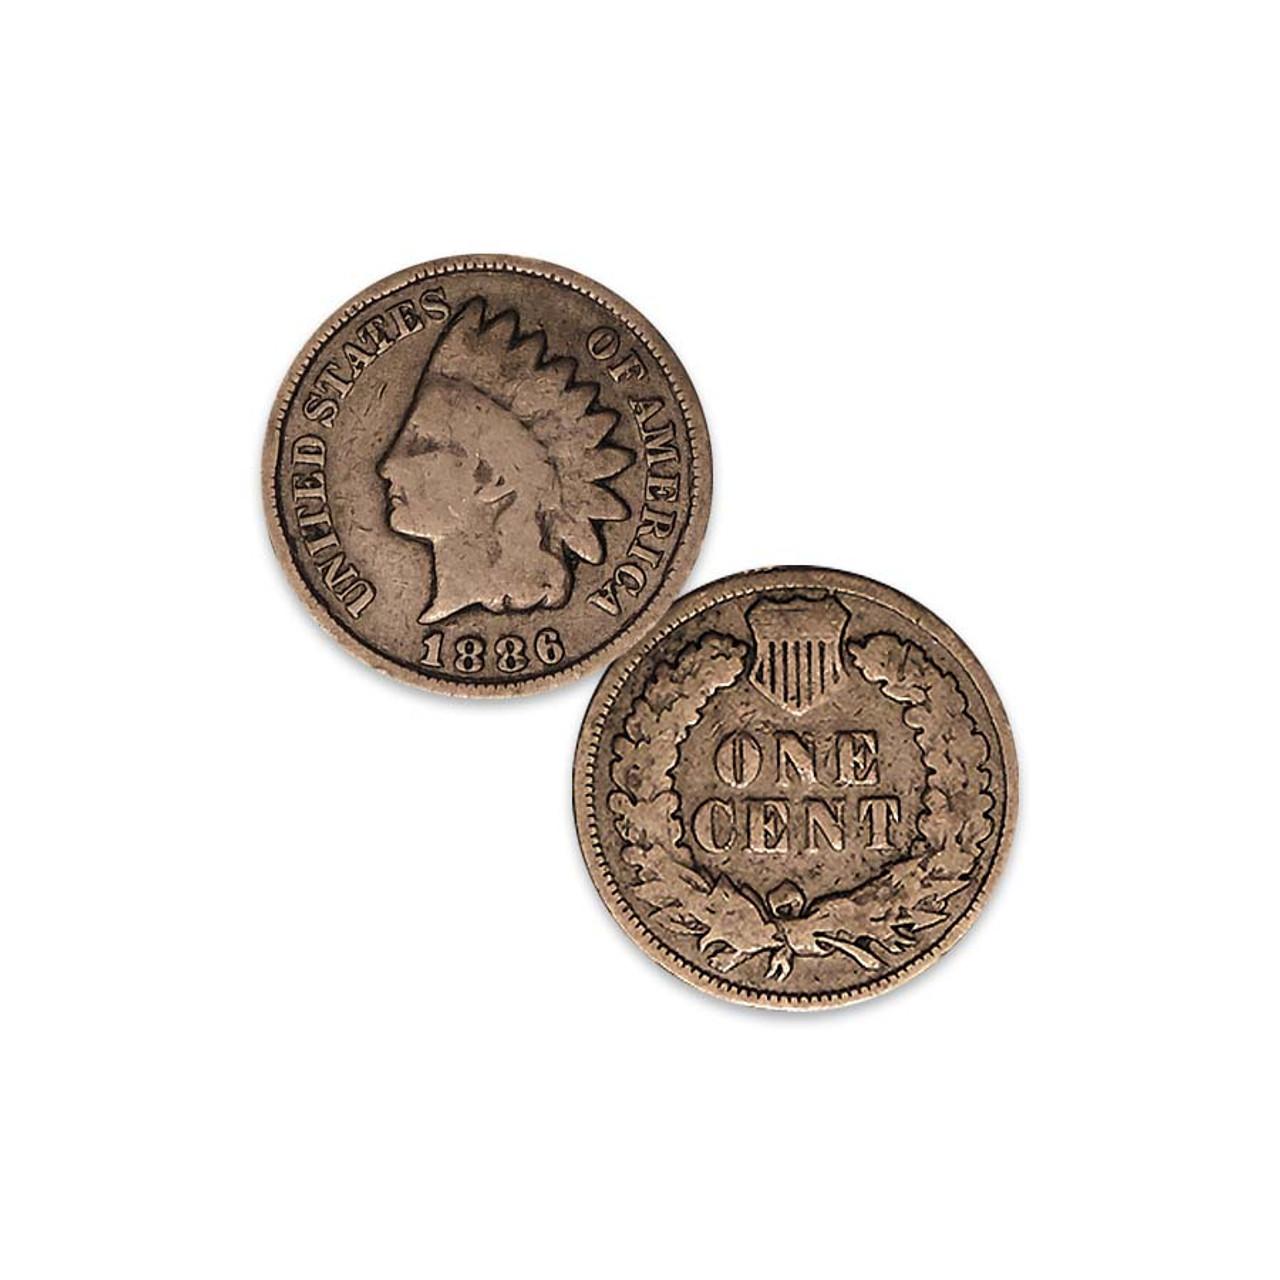 1886 Indian Head Cent Type II Good